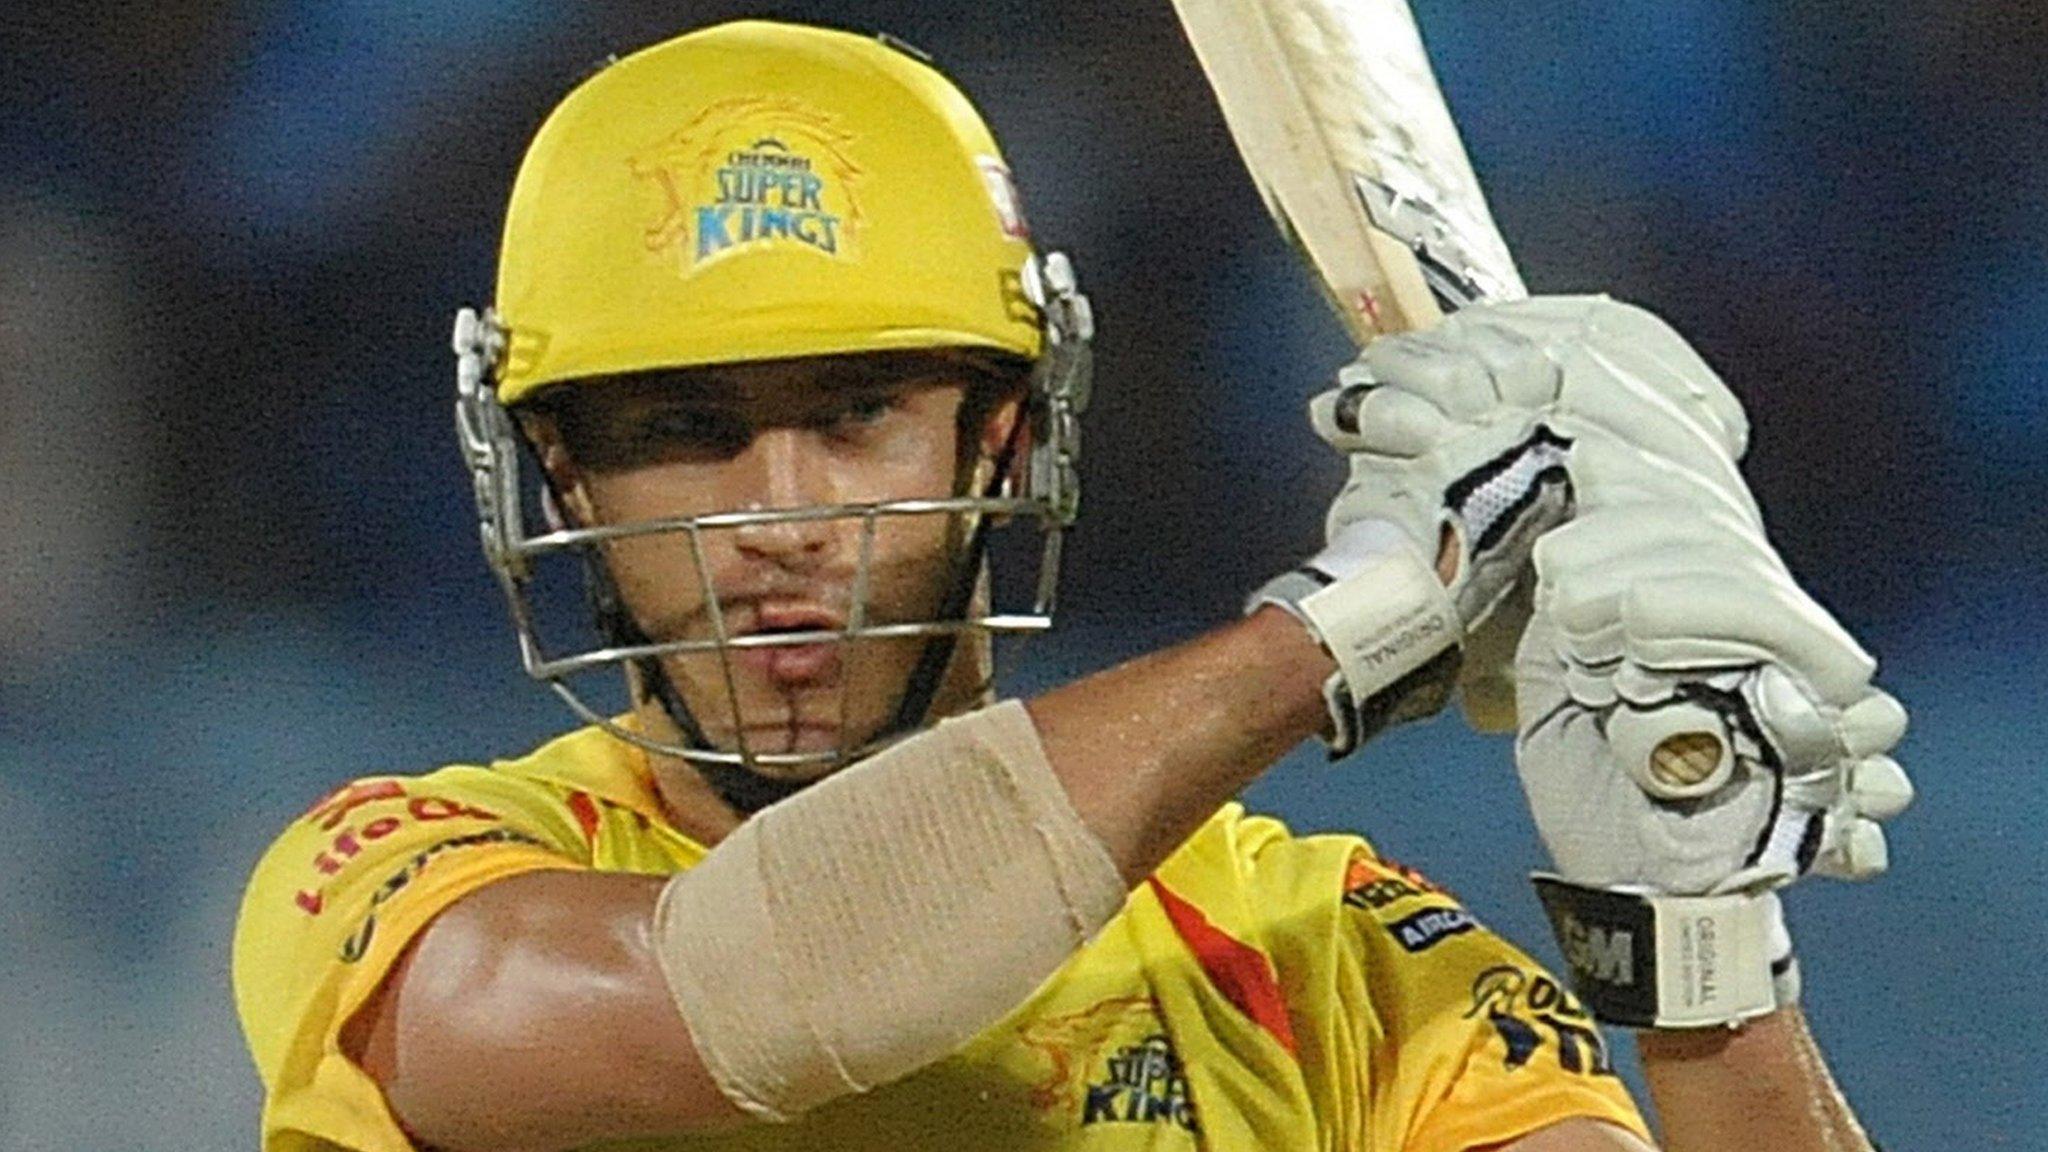 Indian Premier League: Chennai Super Kings beat Sunrisers Hyderabad to reach IPL final